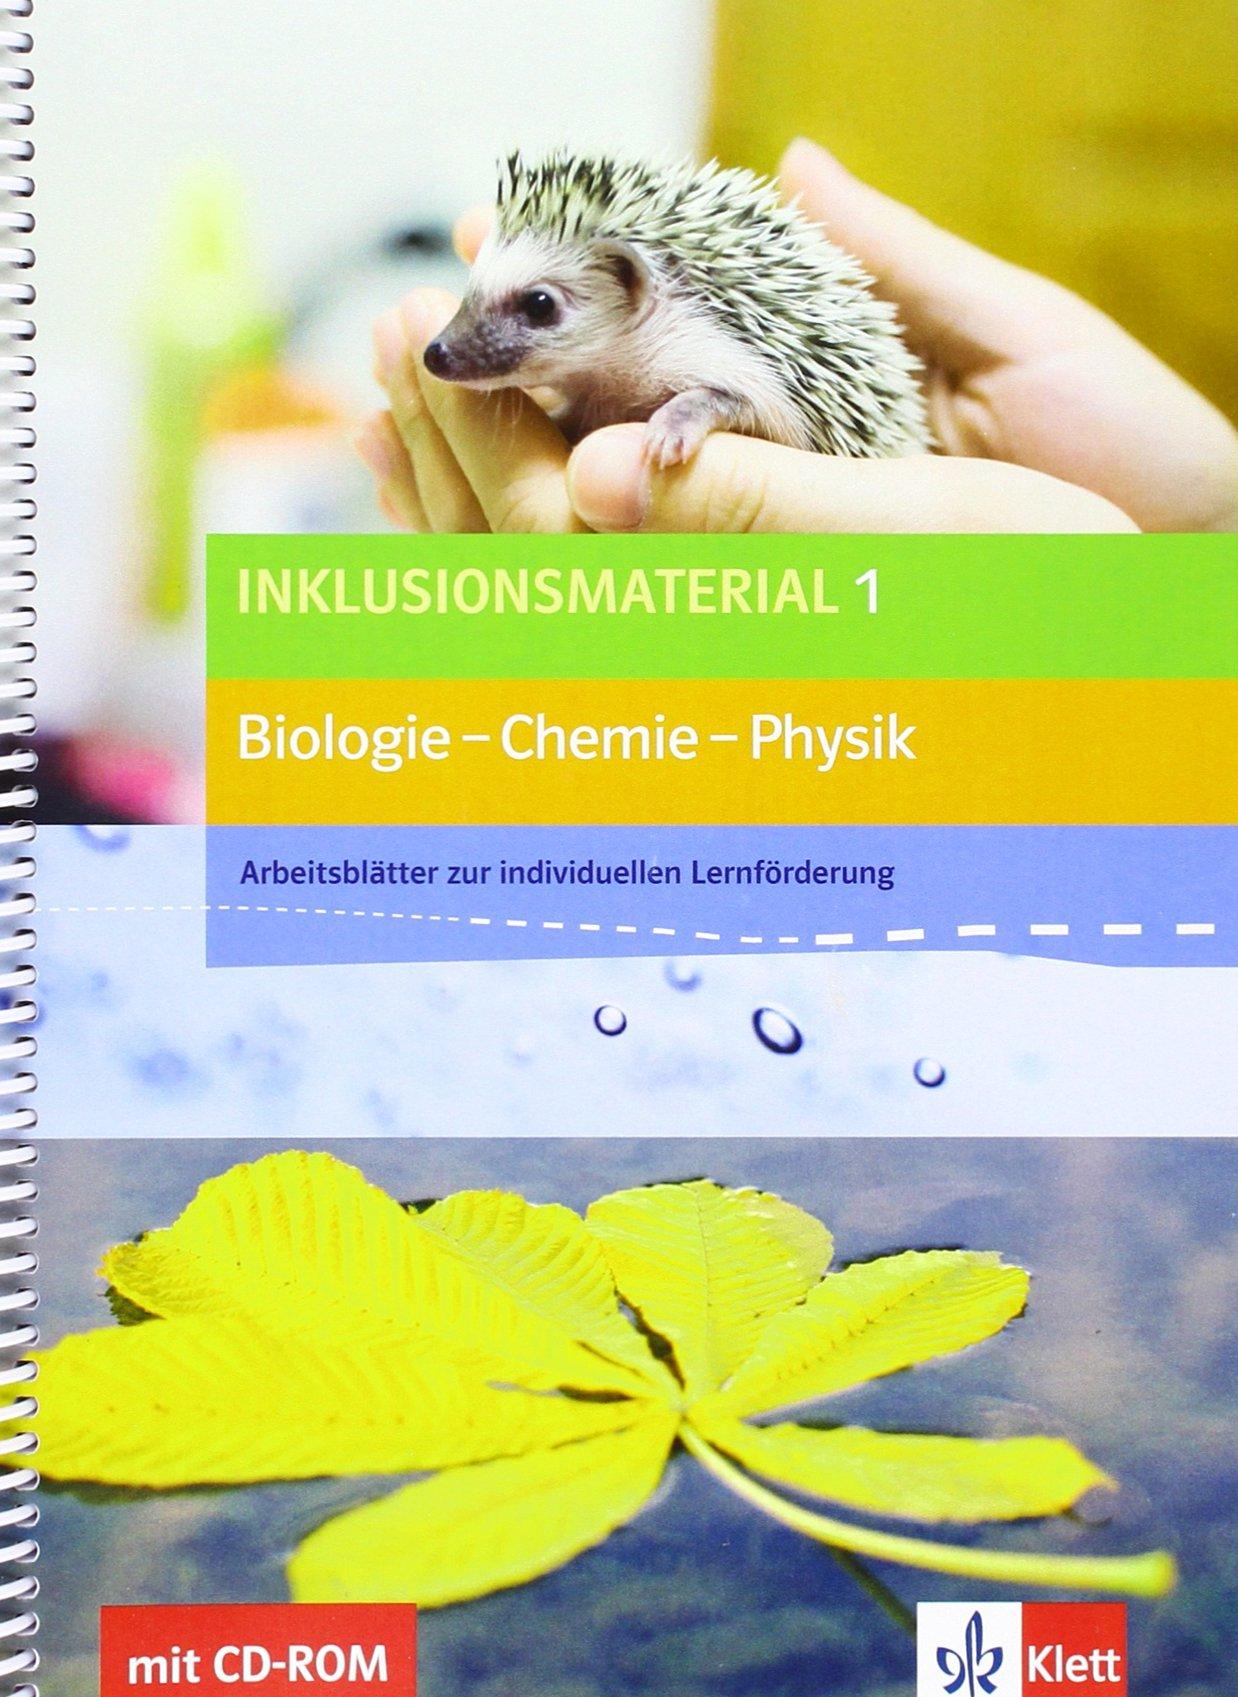 Inklusionsmaterial Biologie - Chemie - Physik / Arbeitsblätter zur ...